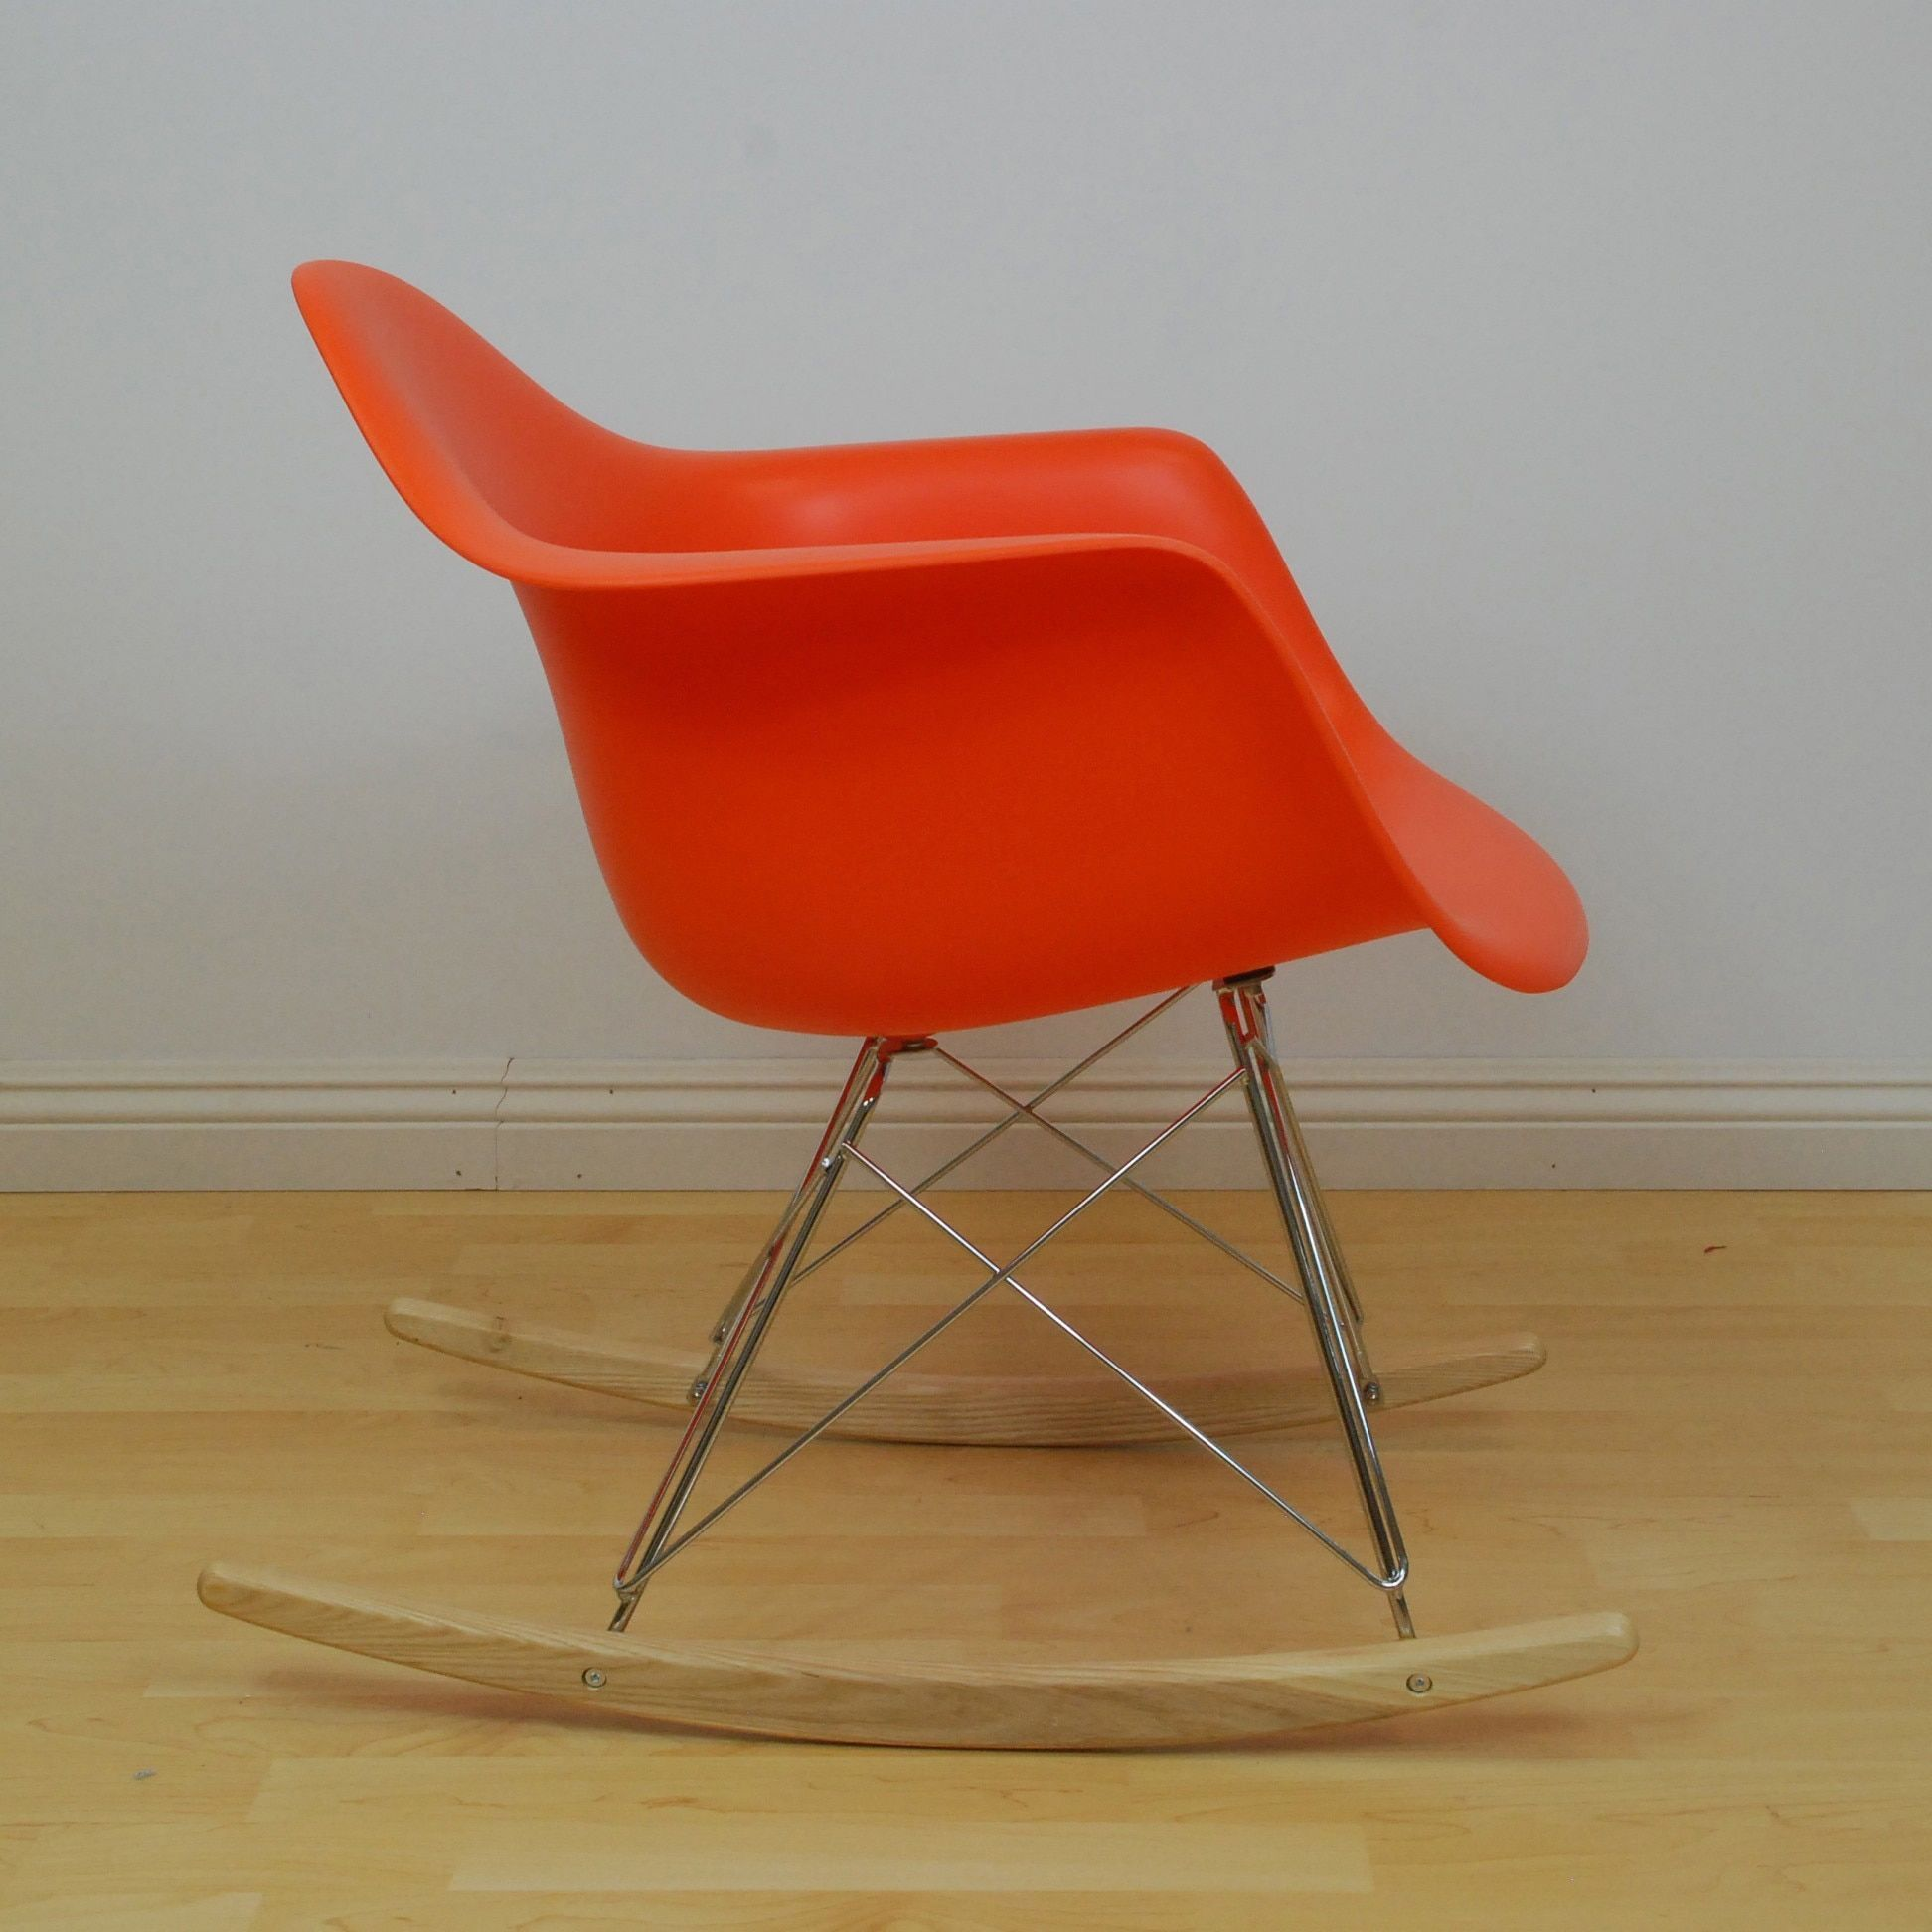 Strange Mod Made Paris Tower Rocker Rocking Chair Products Lamtechconsult Wood Chair Design Ideas Lamtechconsultcom